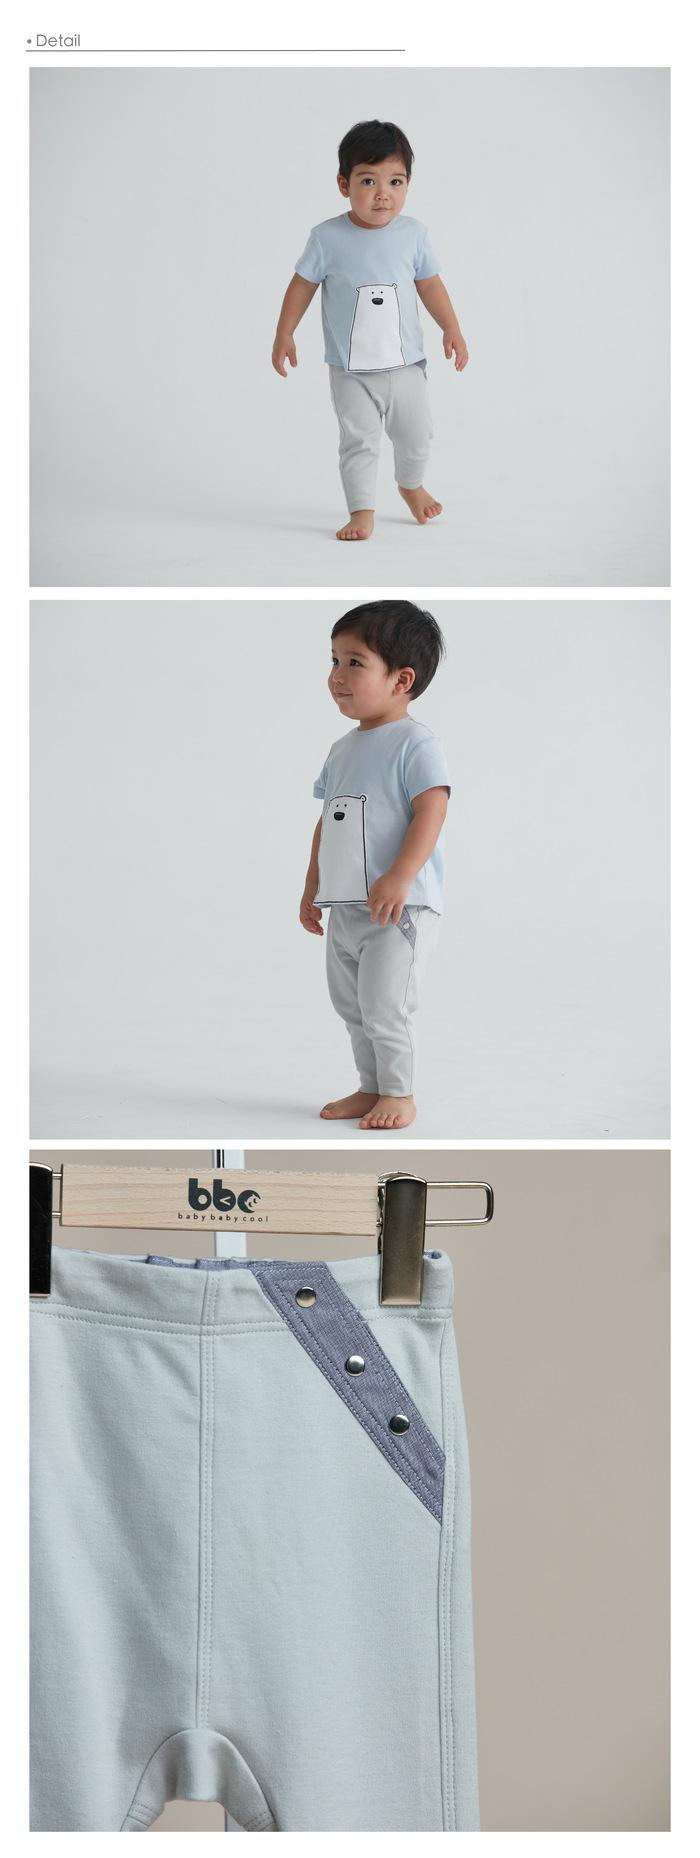 baby baby cool|斜邊條紋長褲